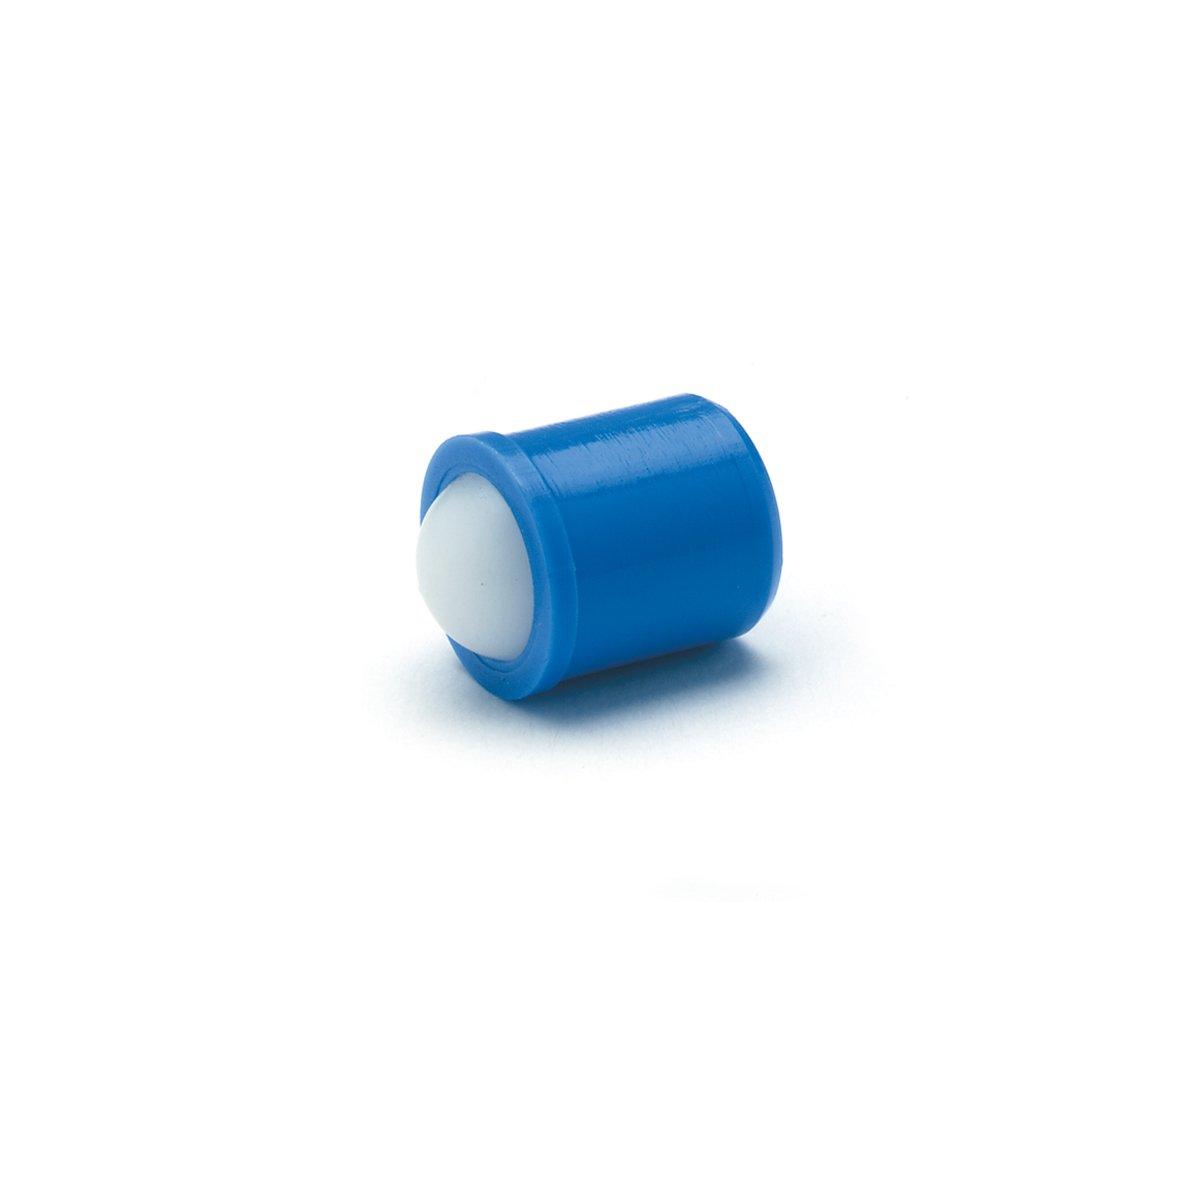 Piezas de presi/ón el/ásticas de Ganter Normelemente para insertar a presi/ón GN 614 GN 614-6-KD acero inoxidable y pl/ástico Azul